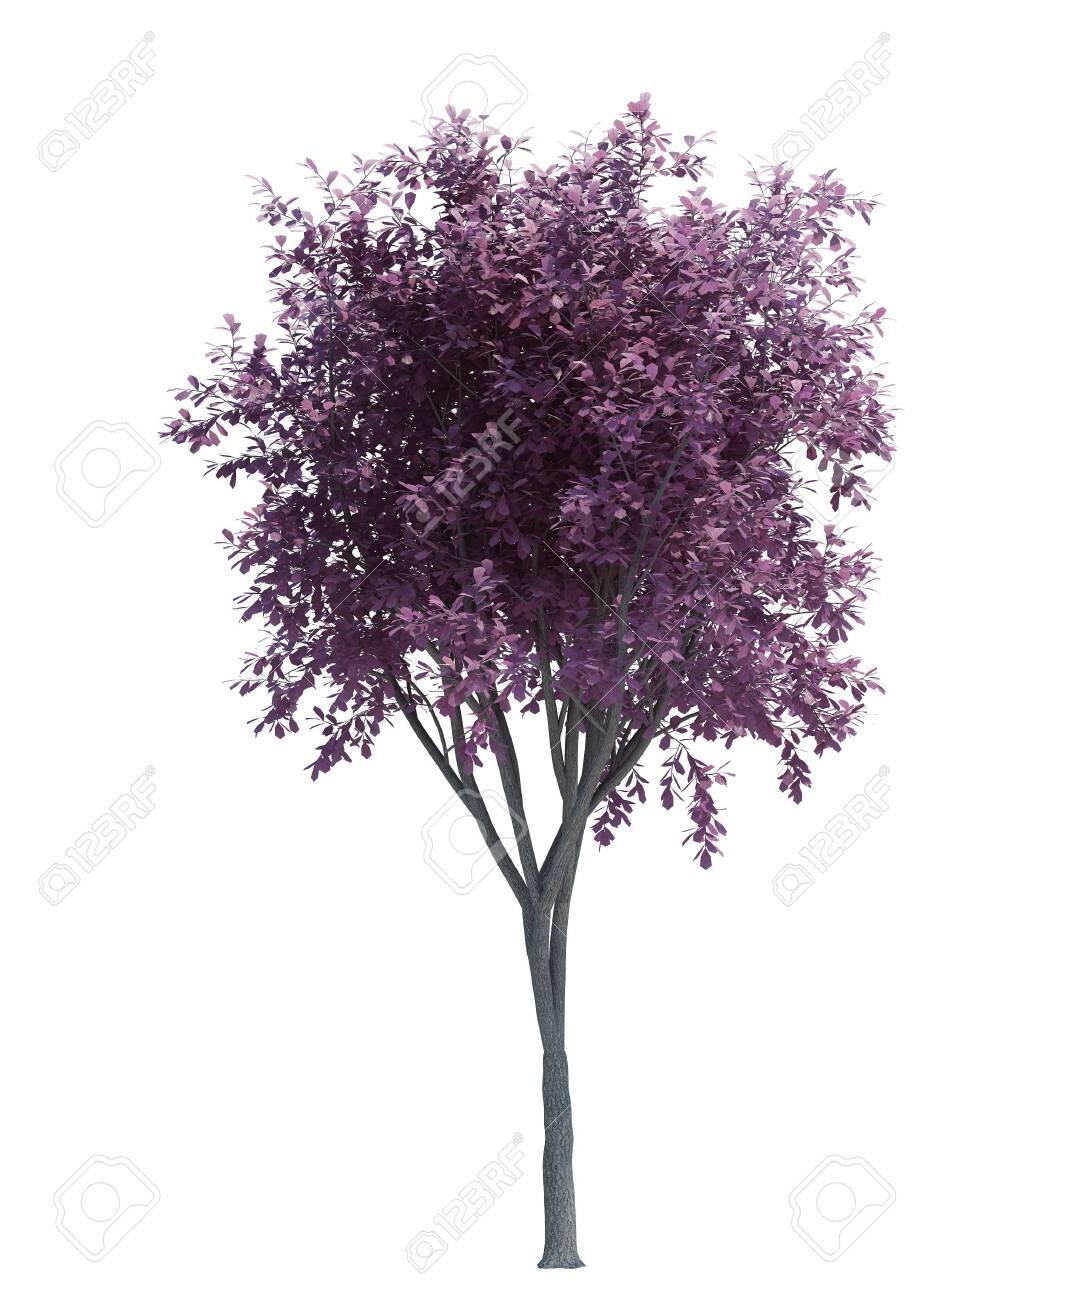 Nature object tree isolated white on background - 154214317